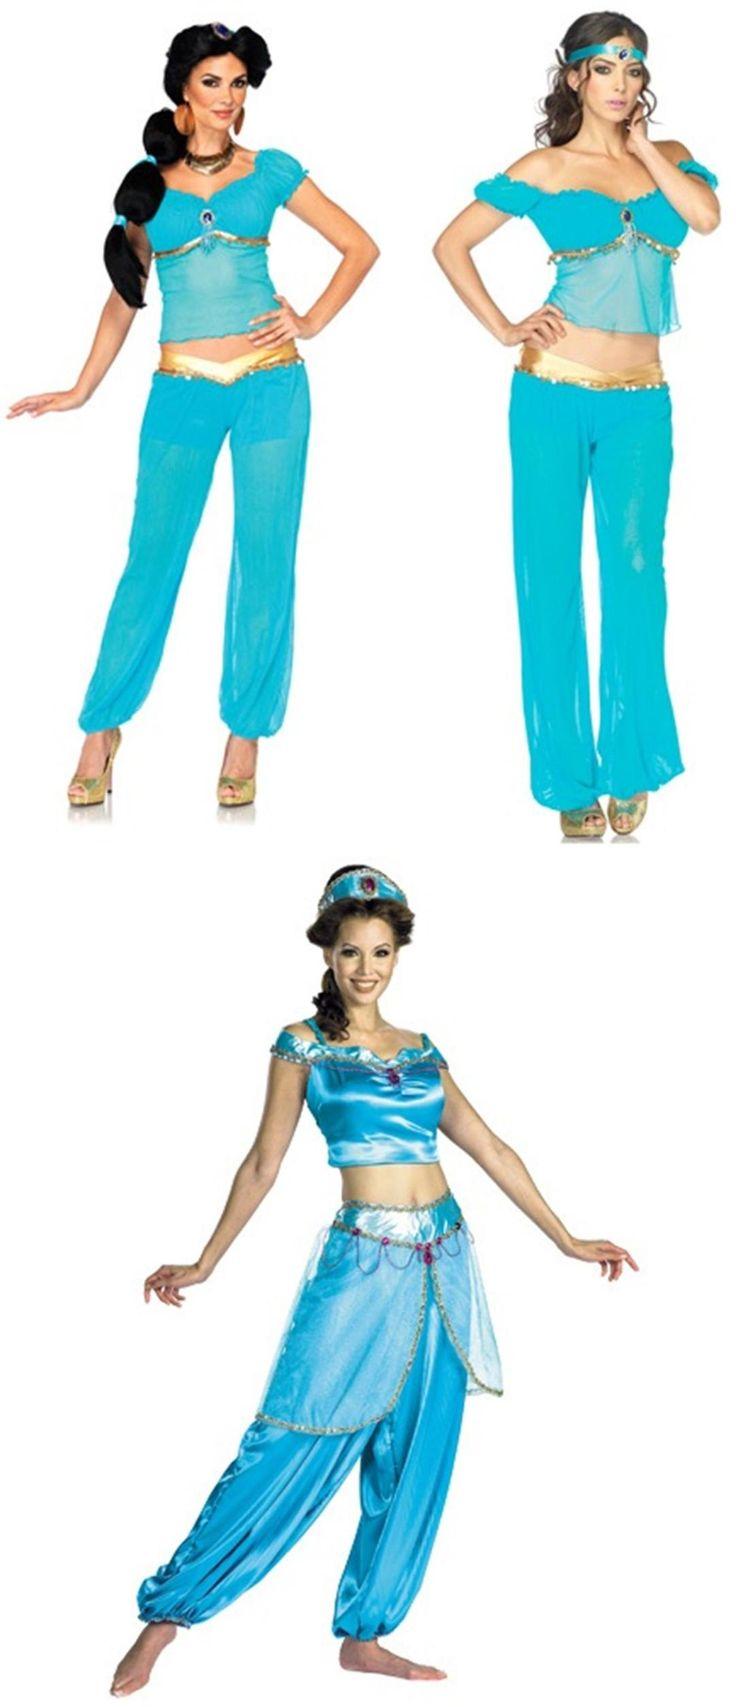 14 Best Genie Images On Pinterest  Belly Dance, Carnivals -2963